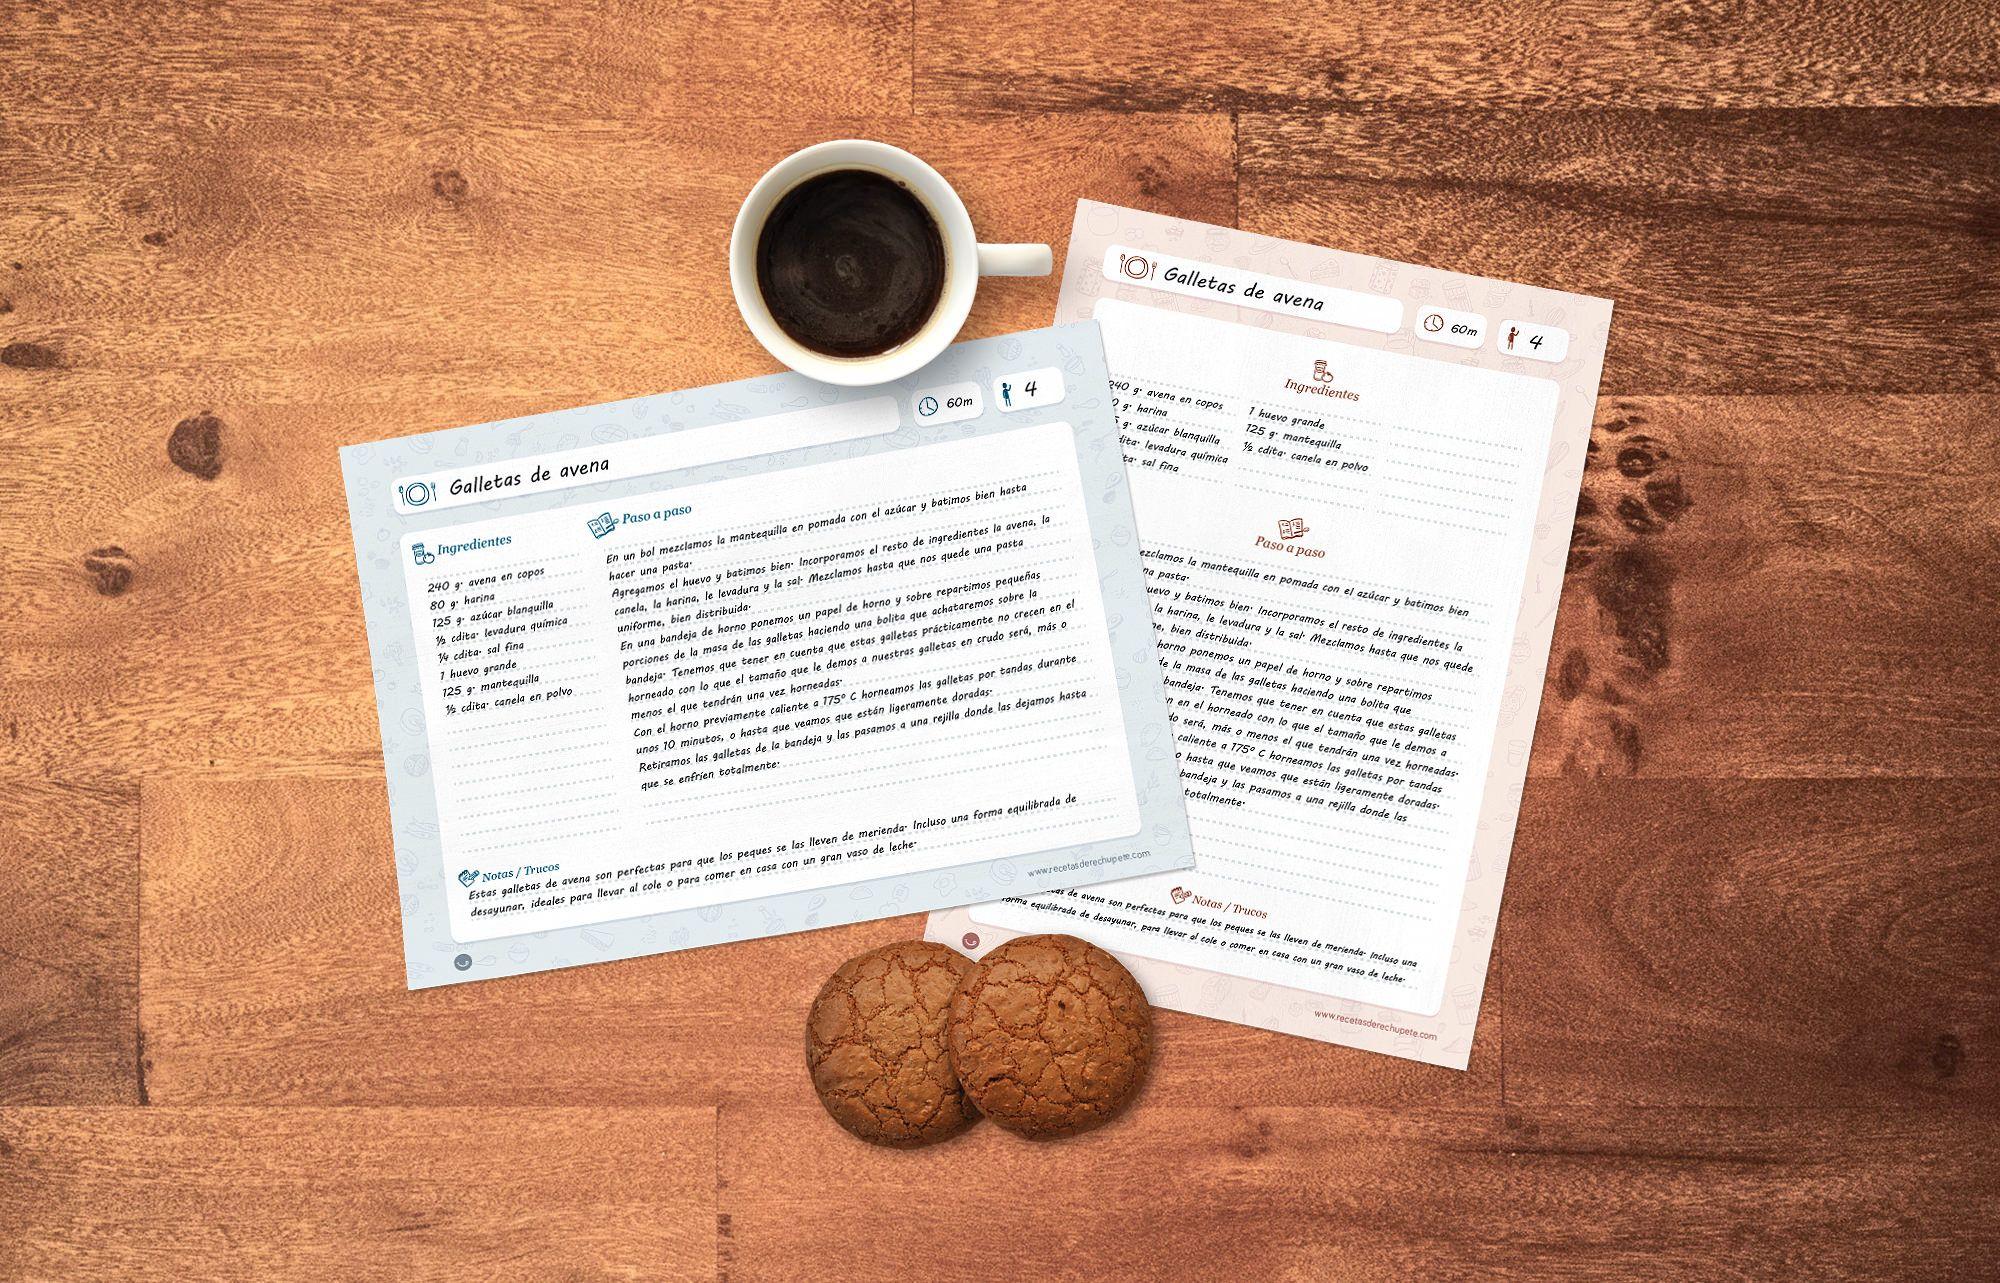 Plantillas gratis para escribir e imprimir recetas | Imprimibles ...